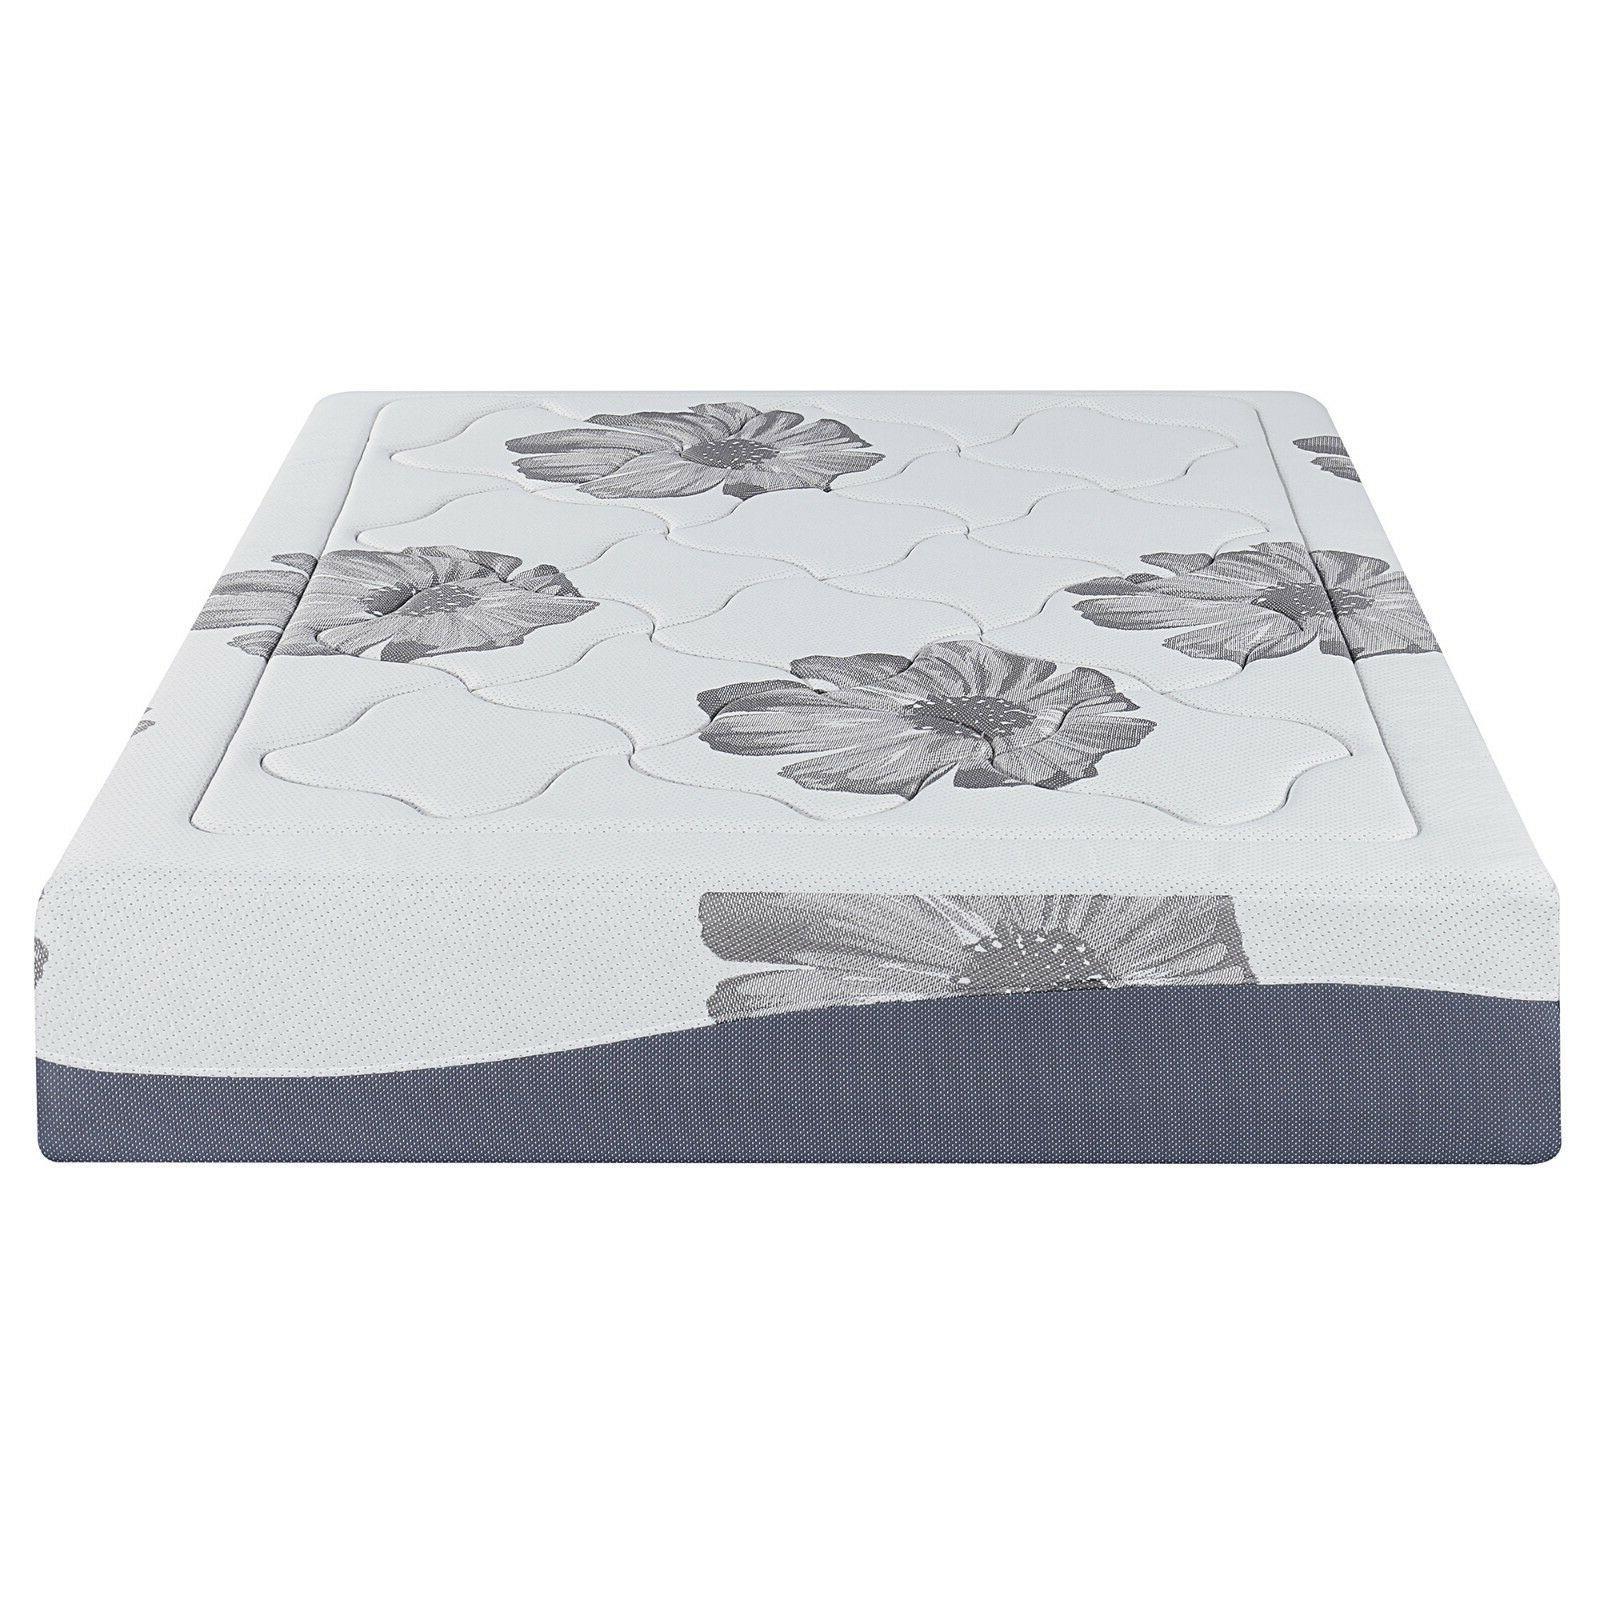 SLEEPLACE Inch Gel Air Flow Foam Mattress, Bed